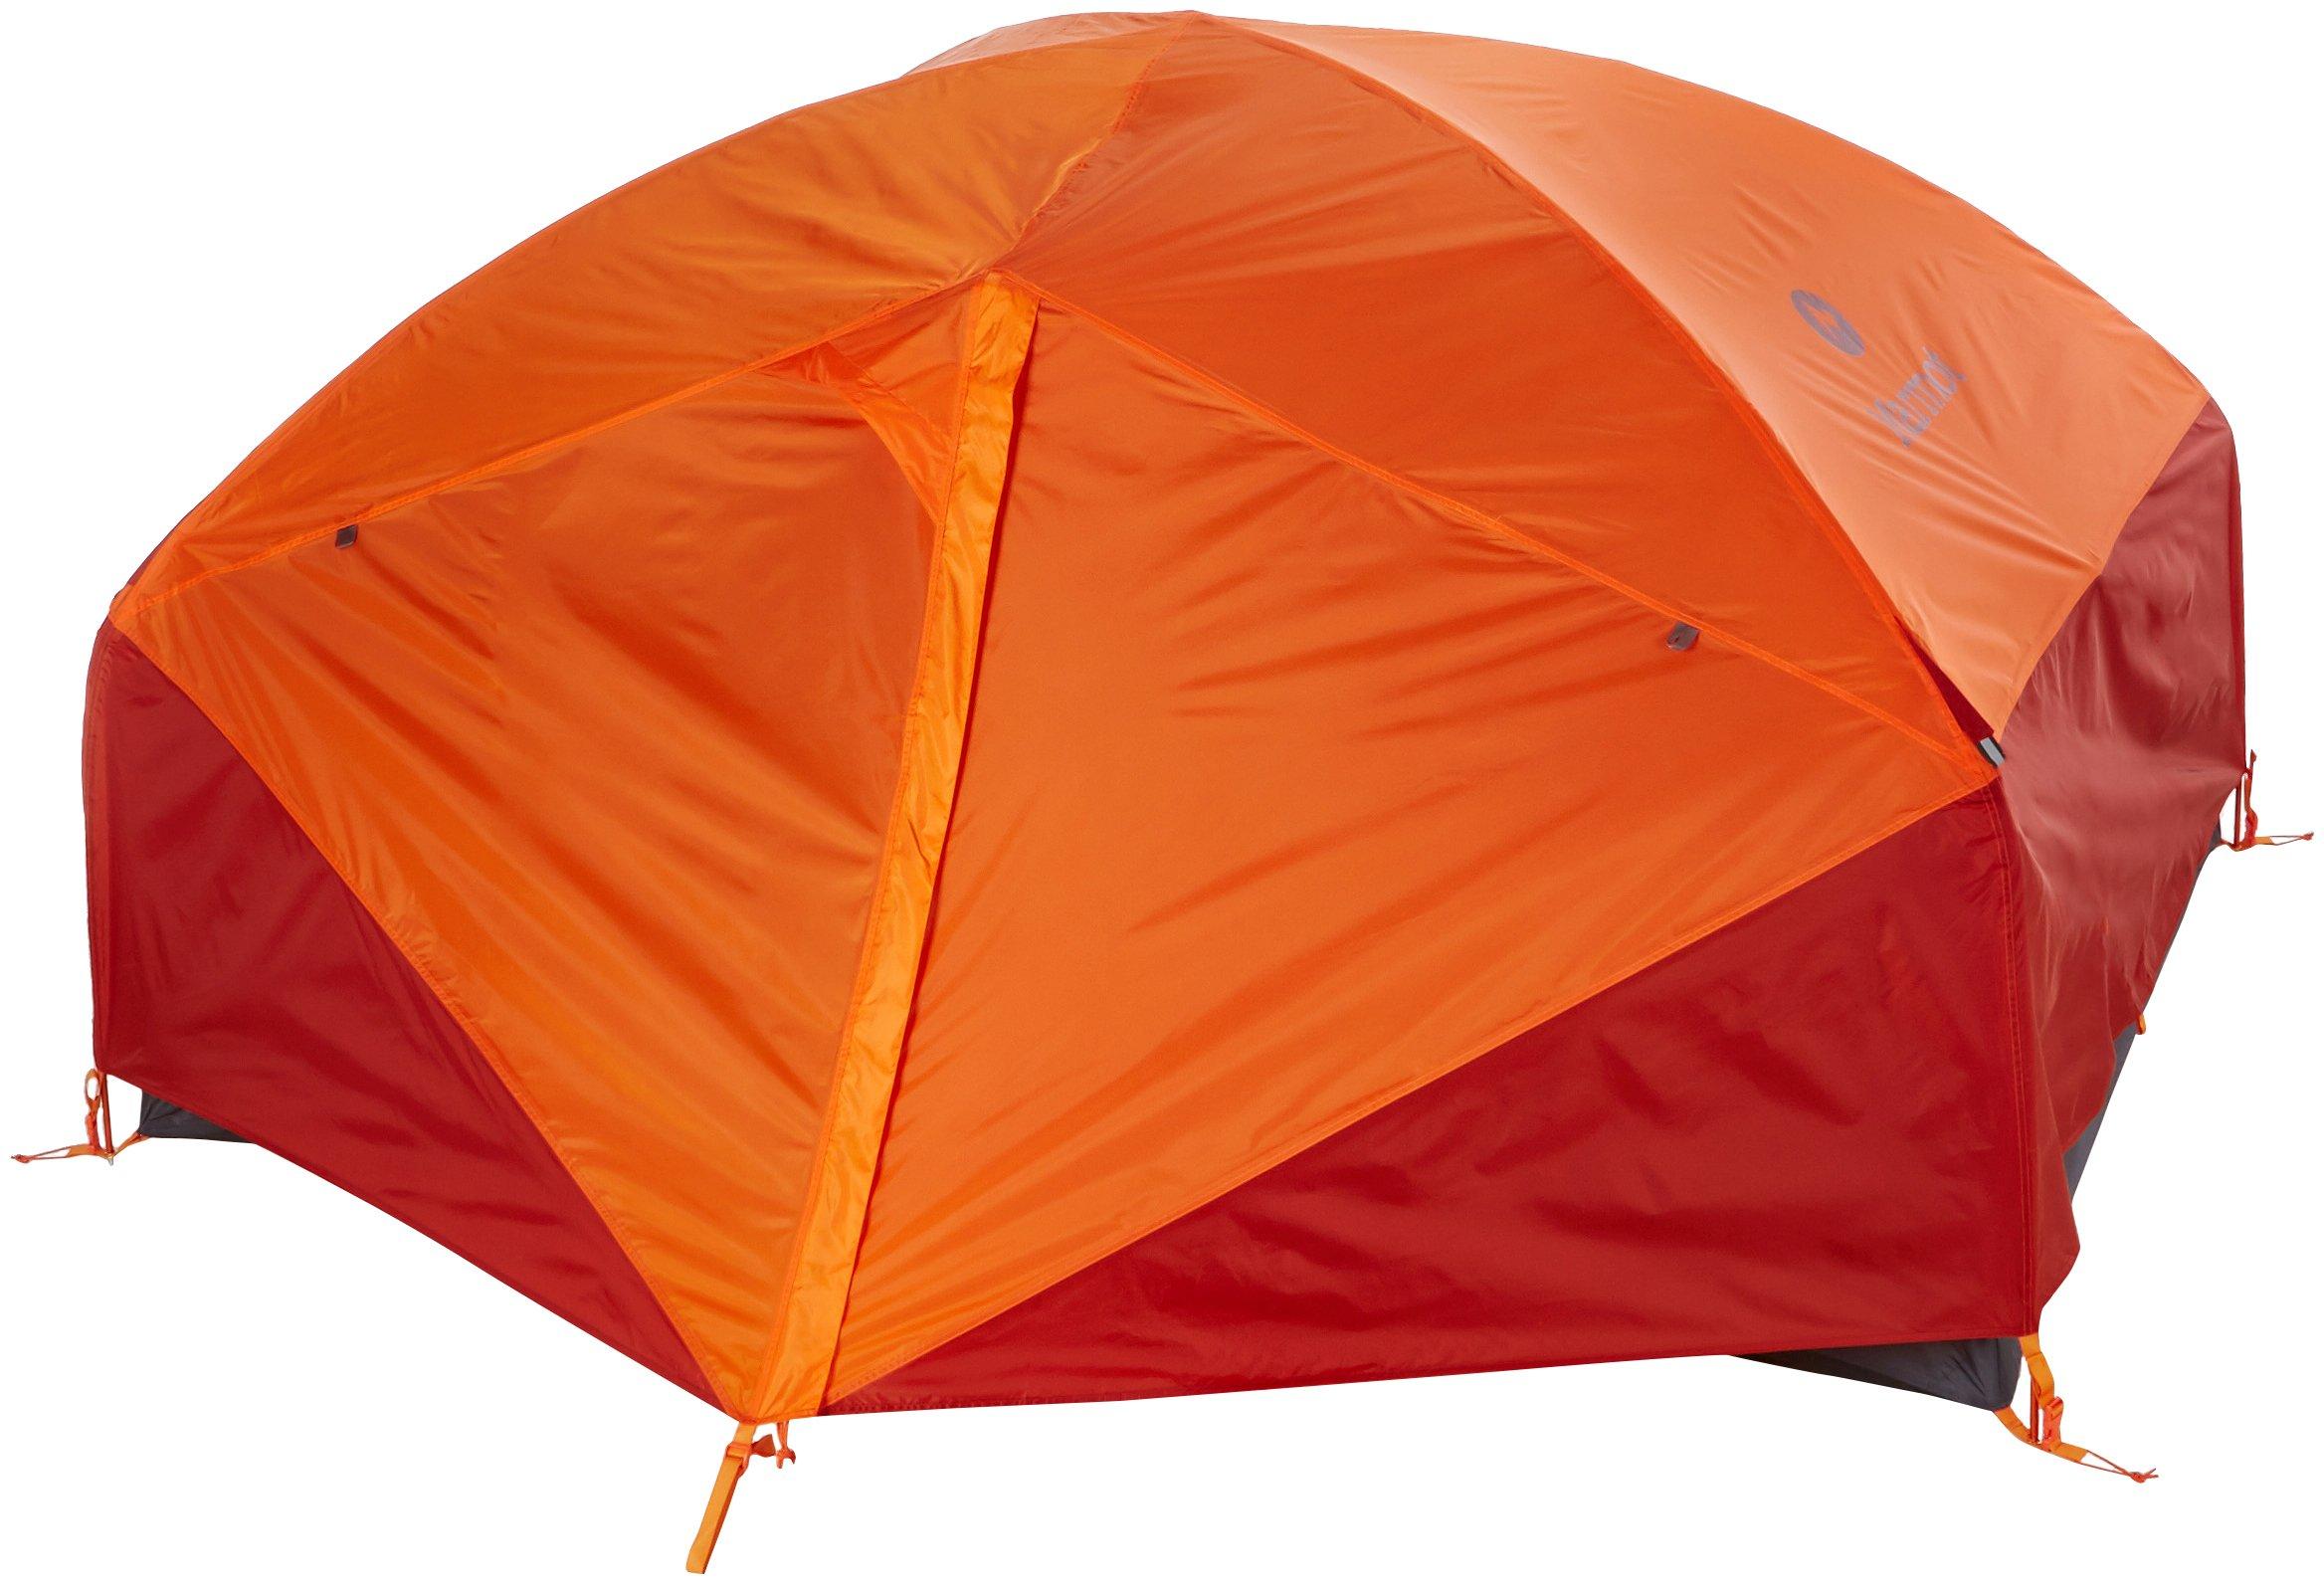 Totalmente Impermeable Trekking peque/ña Tienda de campa/ña Adultos Unisex Cinder//Rusted Orange Marmot Limelight 3P Ultraligera para 3 Personas